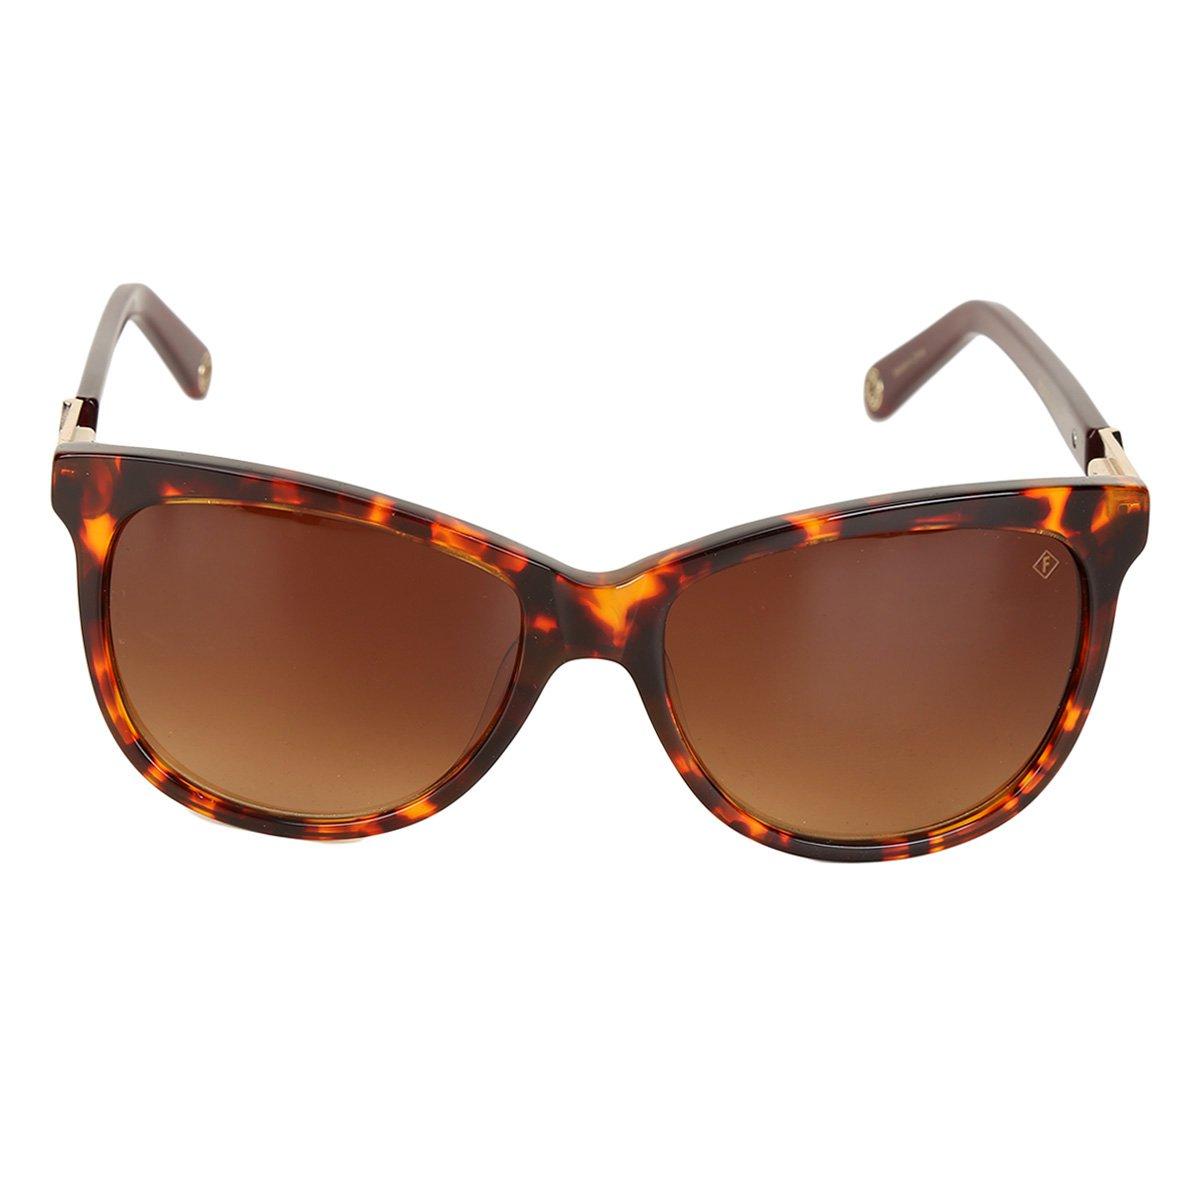 Óculos de Sol Forum F001F0534 Degradê Feminino - Compre Agora   Netshoes f72c7f1db4